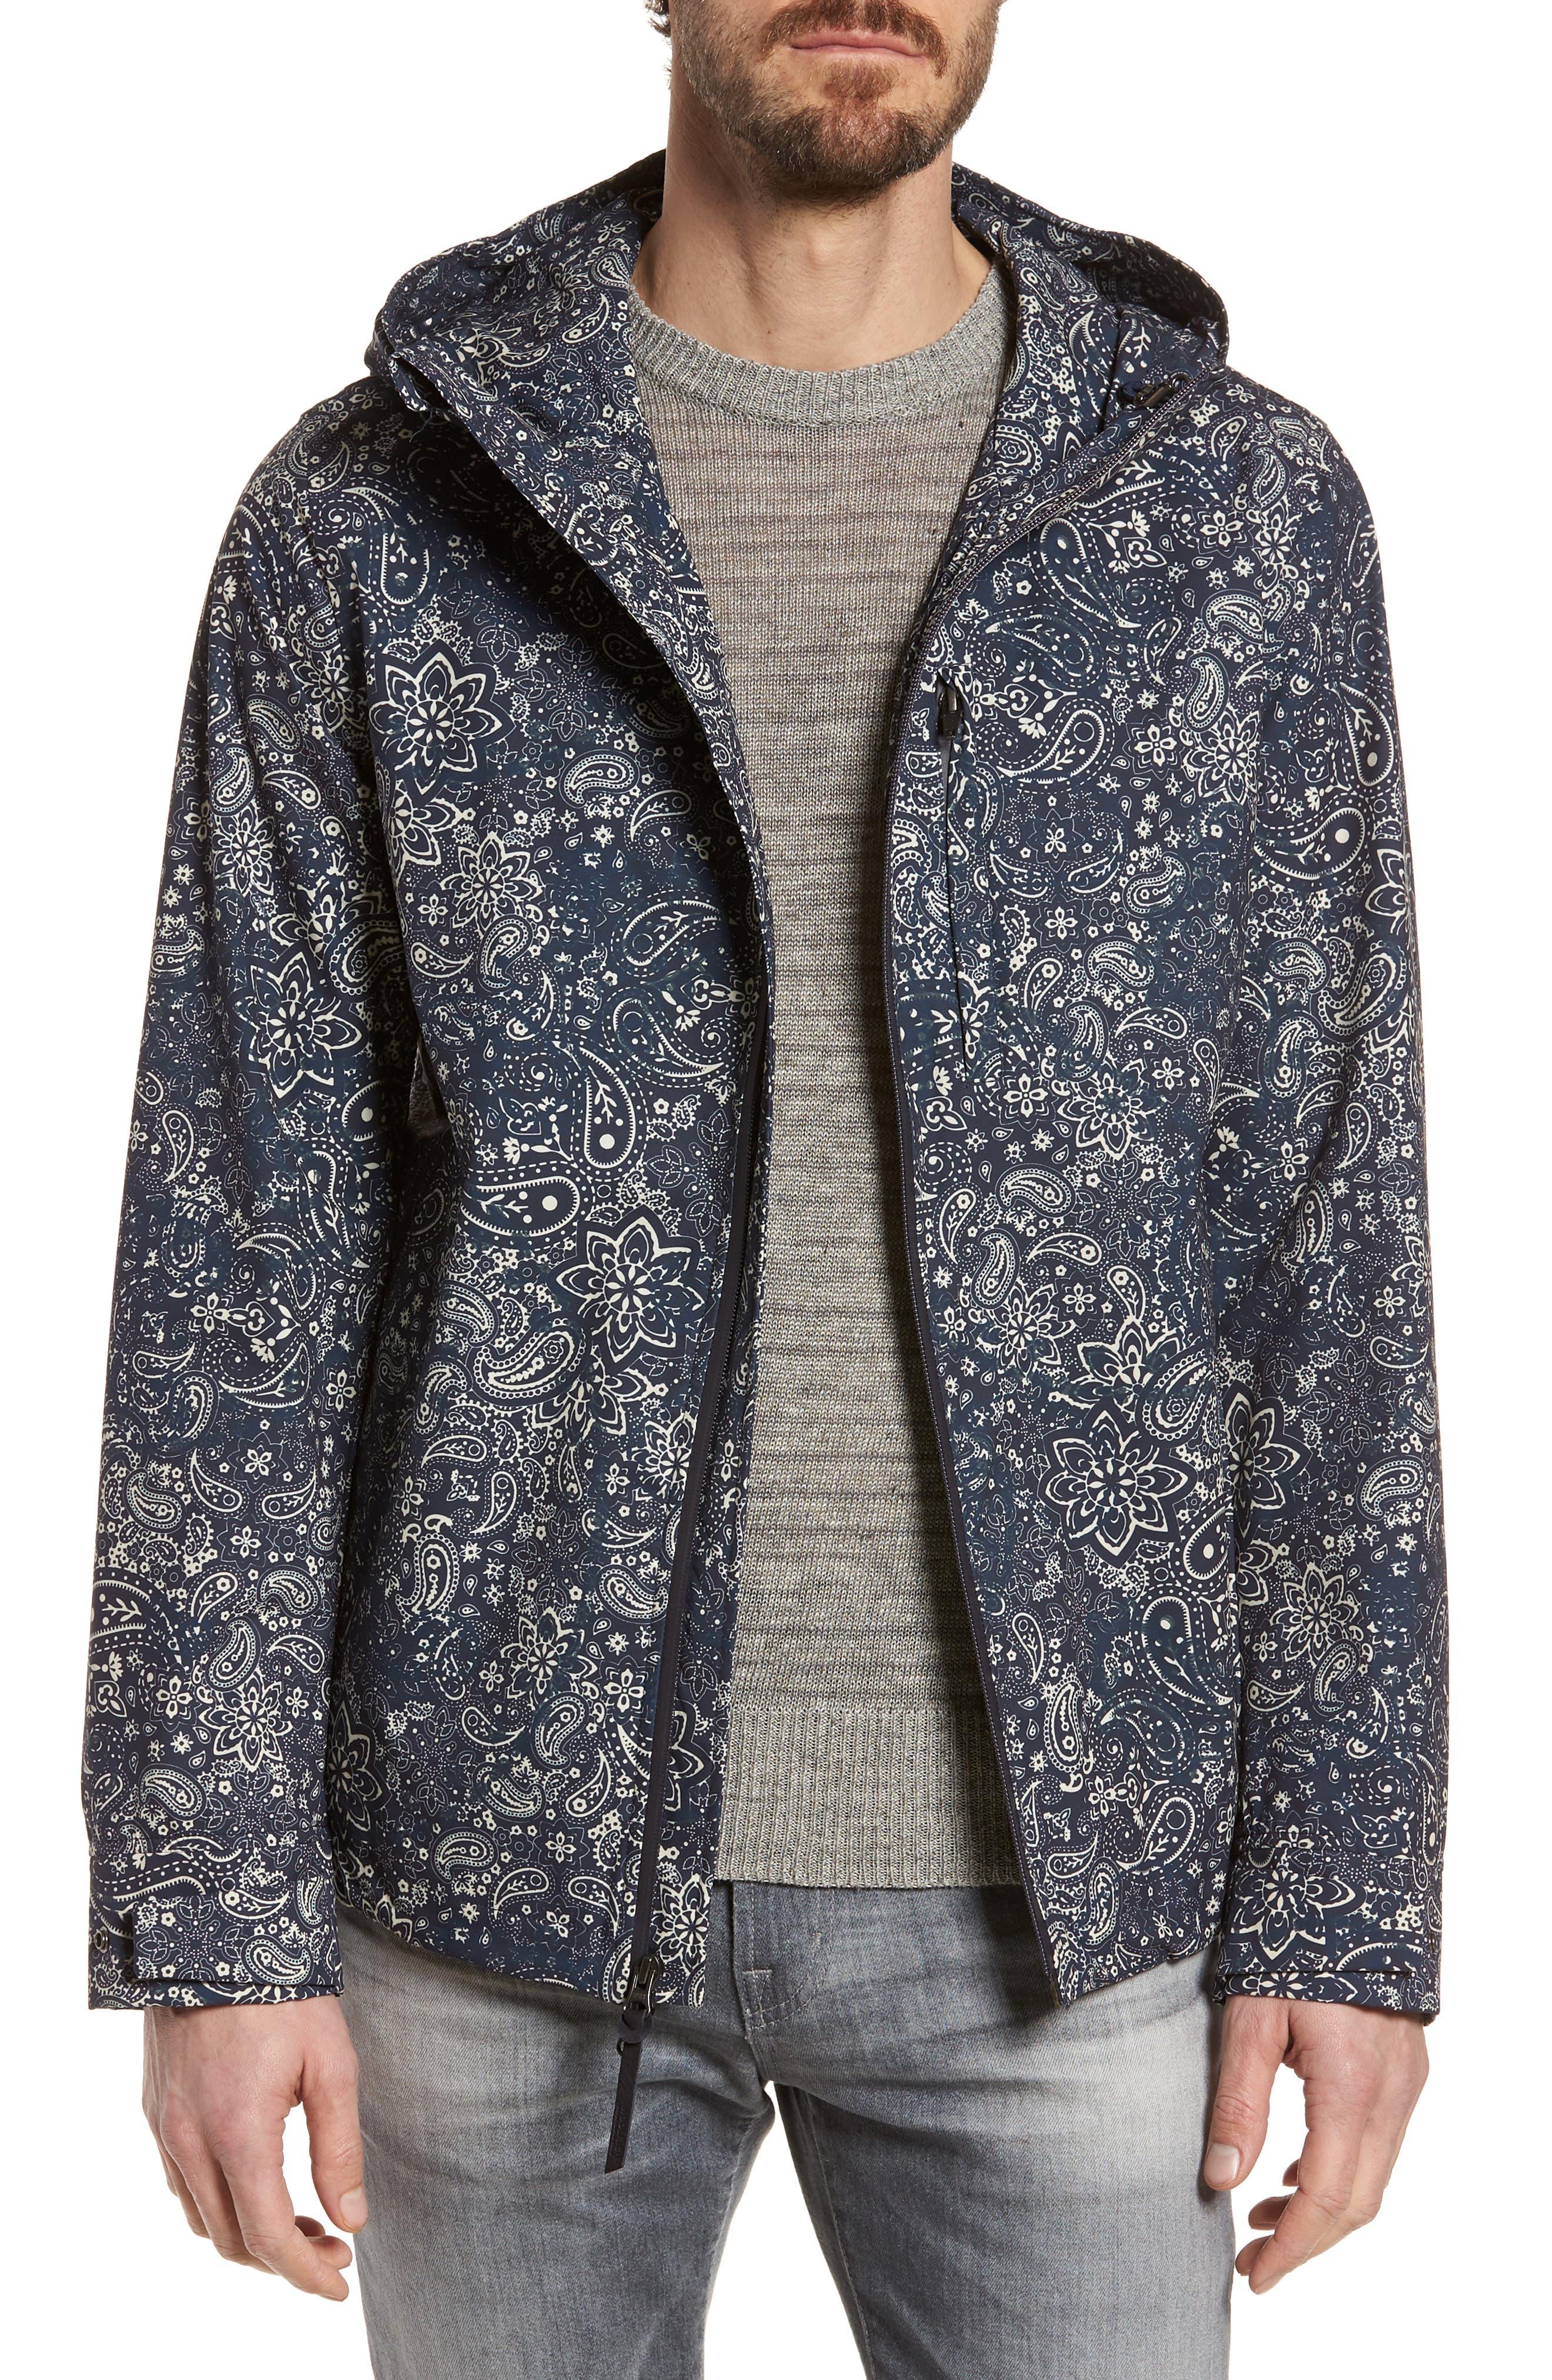 & Bros. Southbay Jacket,                         Main,                         color, 400